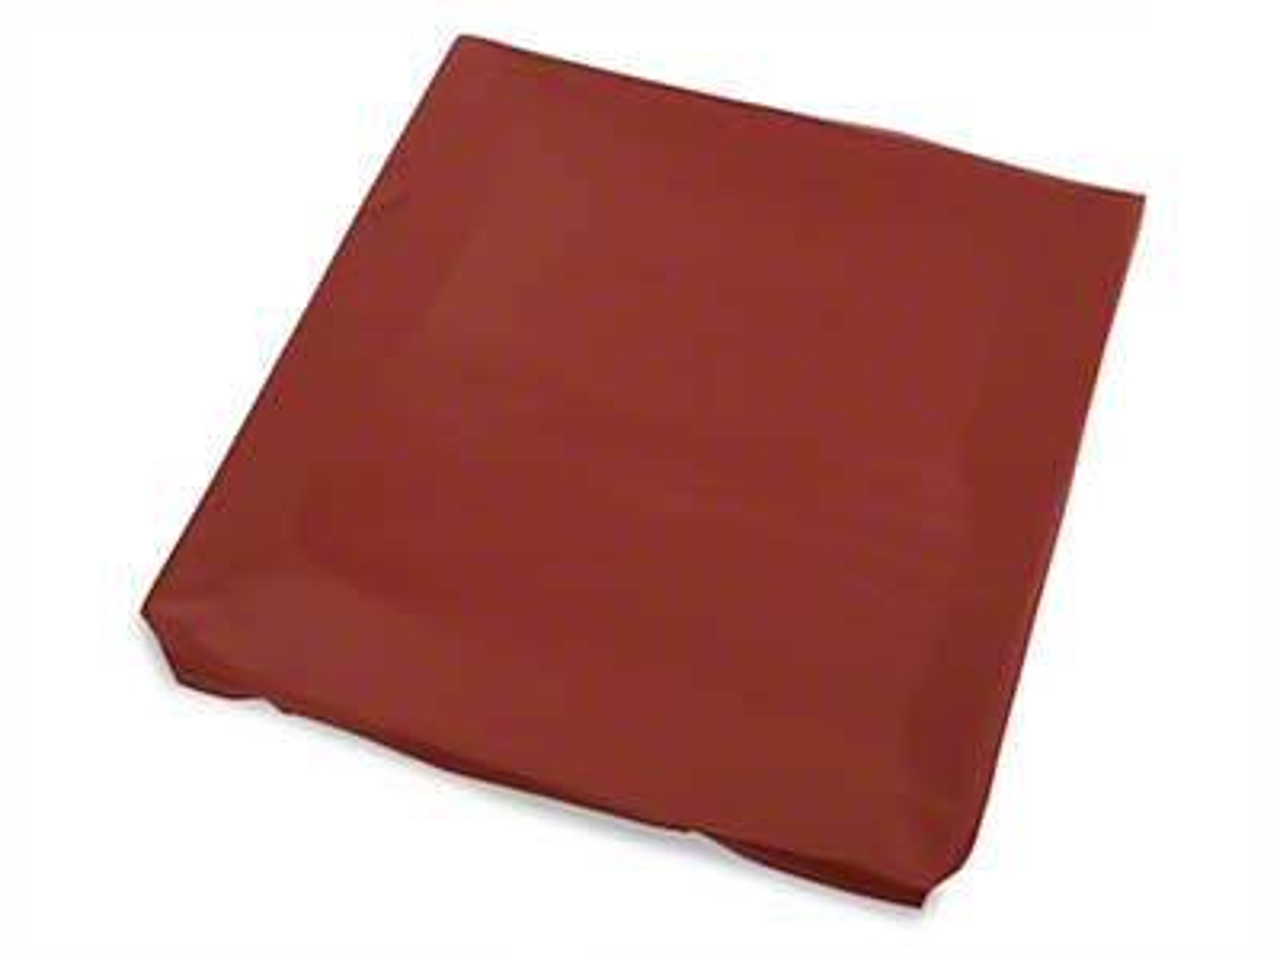 TMI Red Vinyl Headliner - Sunroof (79-93 Coupe, Hatchback)